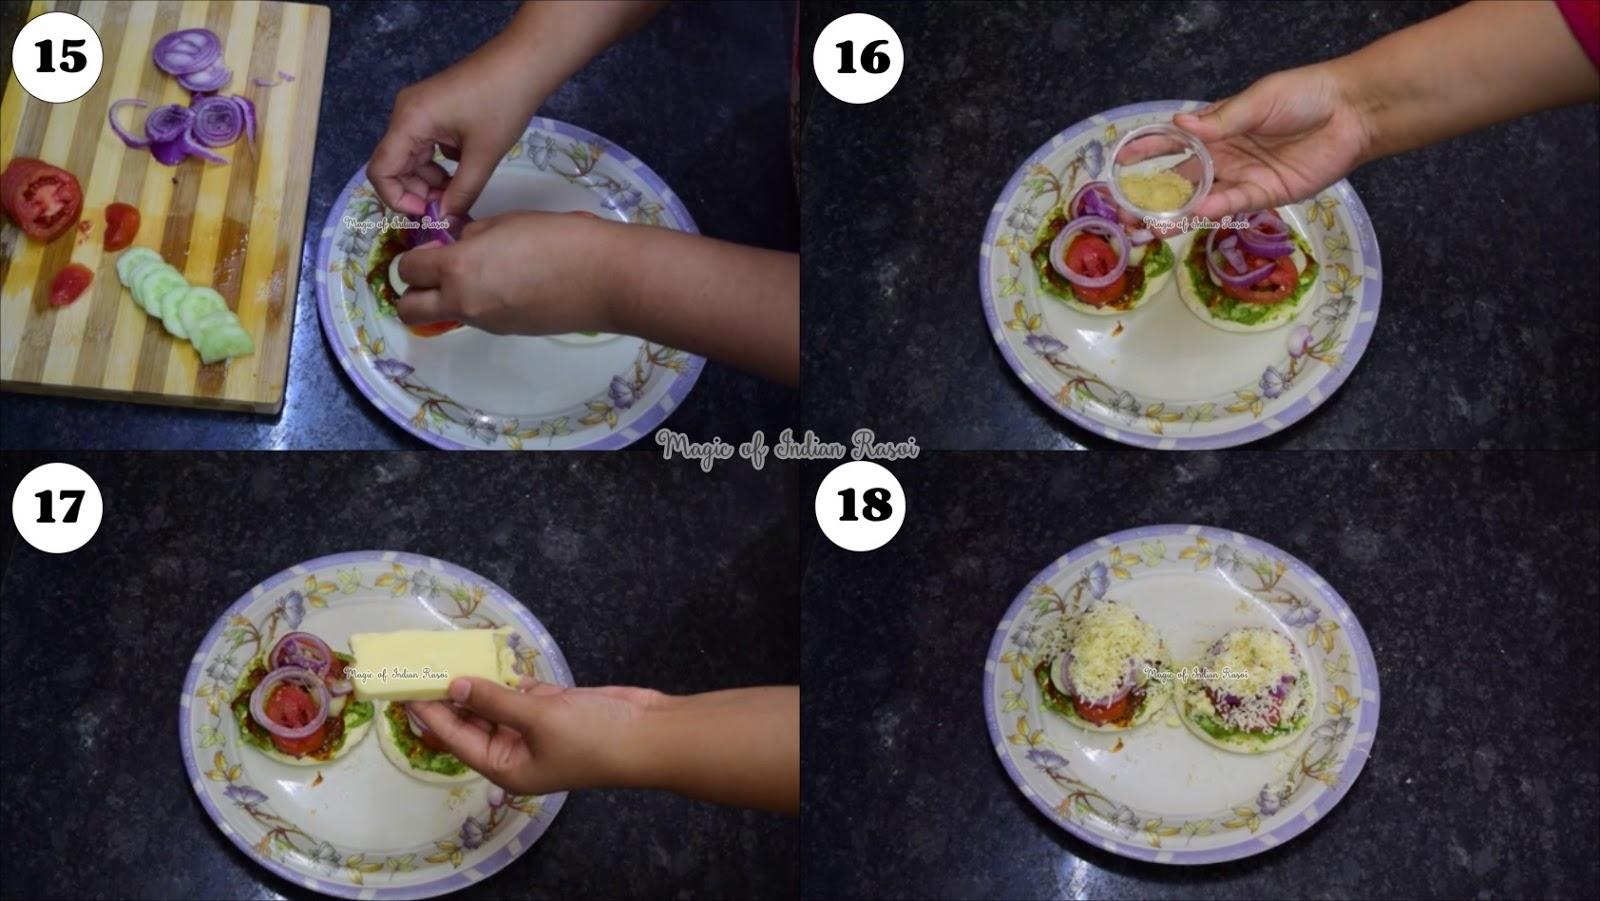 Masala Sandwich Pizza Recipe - मसाला सैंडविच पिज़्ज़ा रेसिपी - Priya R - Magic of Indian Rasoi